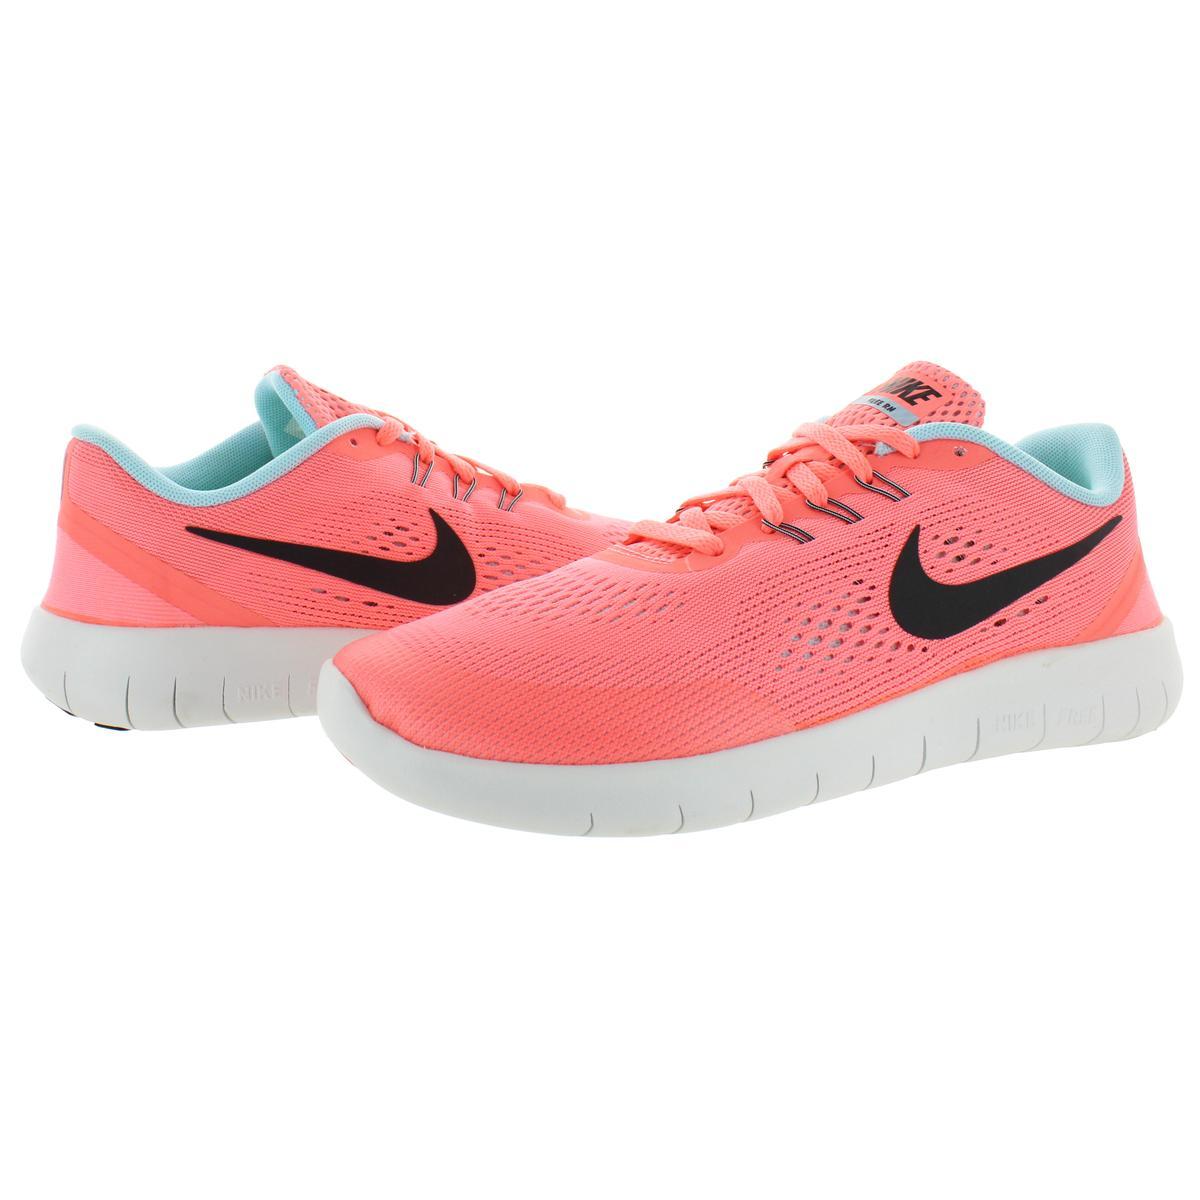 Nike Girls Free RN Trainers Lightweight